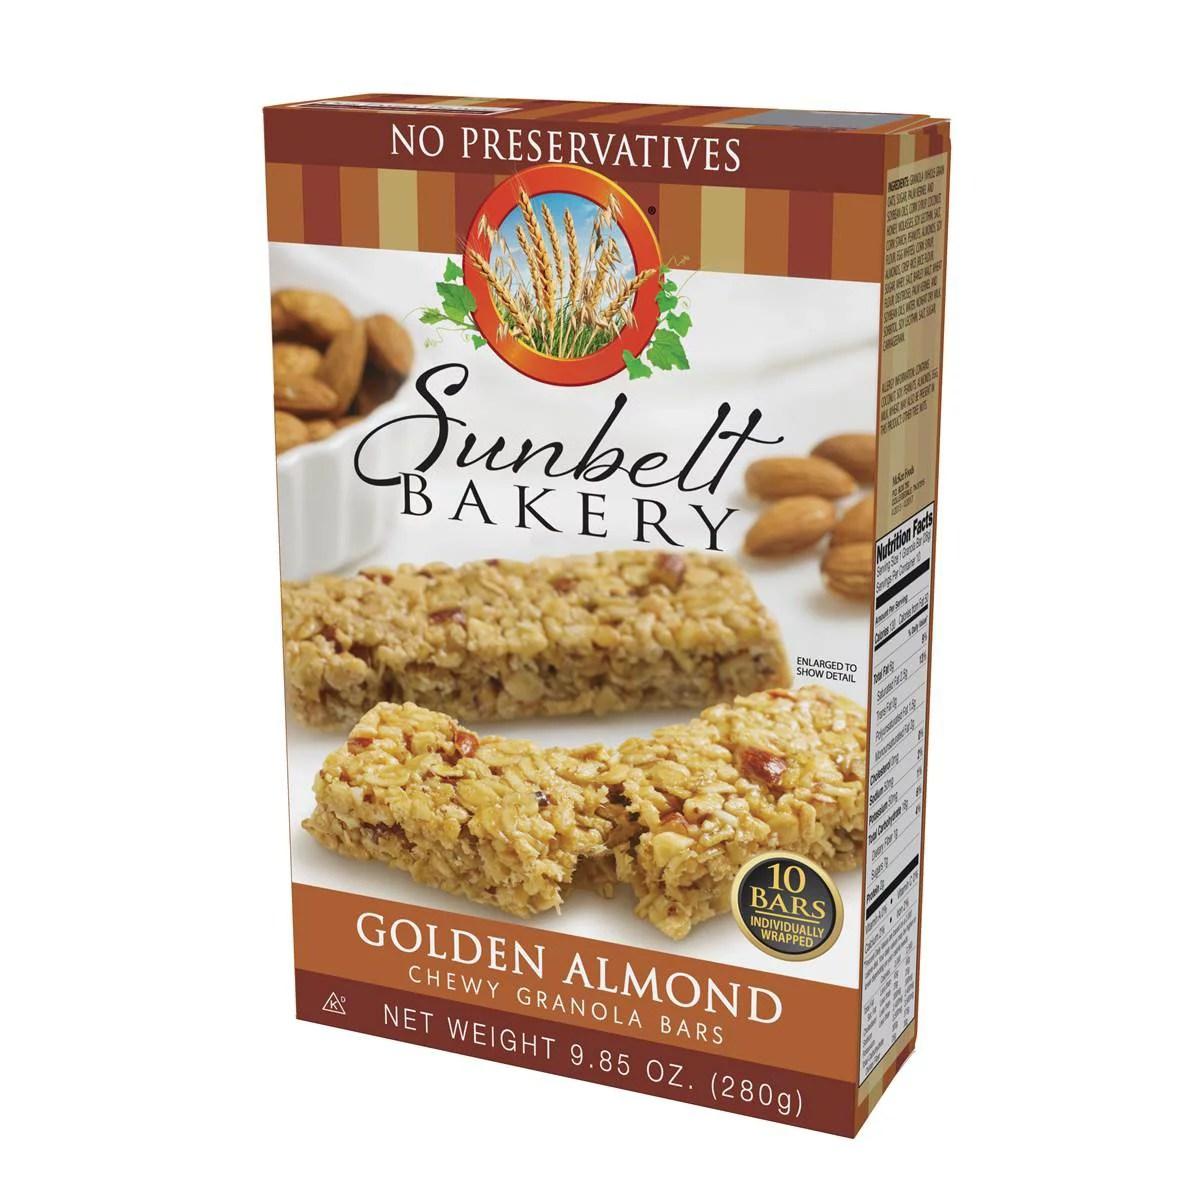 Sunbelt Bakery Golden Almond Chewy Granola Bars 985 oz